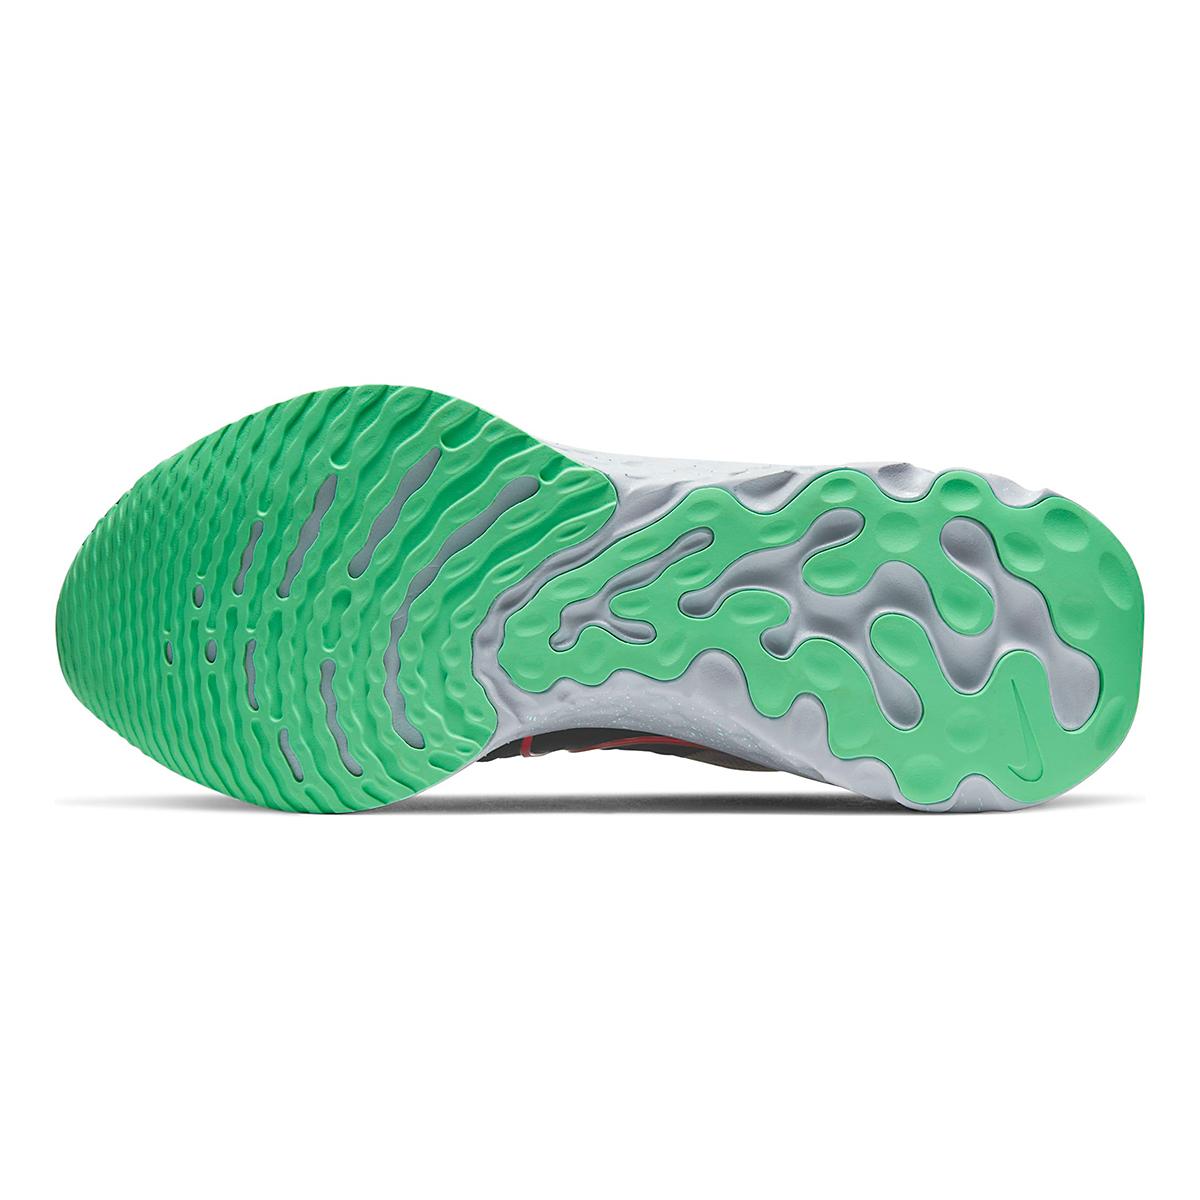 Men's Nike React Infinity Run Flyknit 2 Running Shoe - Color: Ridgerock/Chile Red/Black/Green Glow - Size: 6 - Width: Regular, Ridgerock/Chile Red/Black/Green Glow, large, image 3